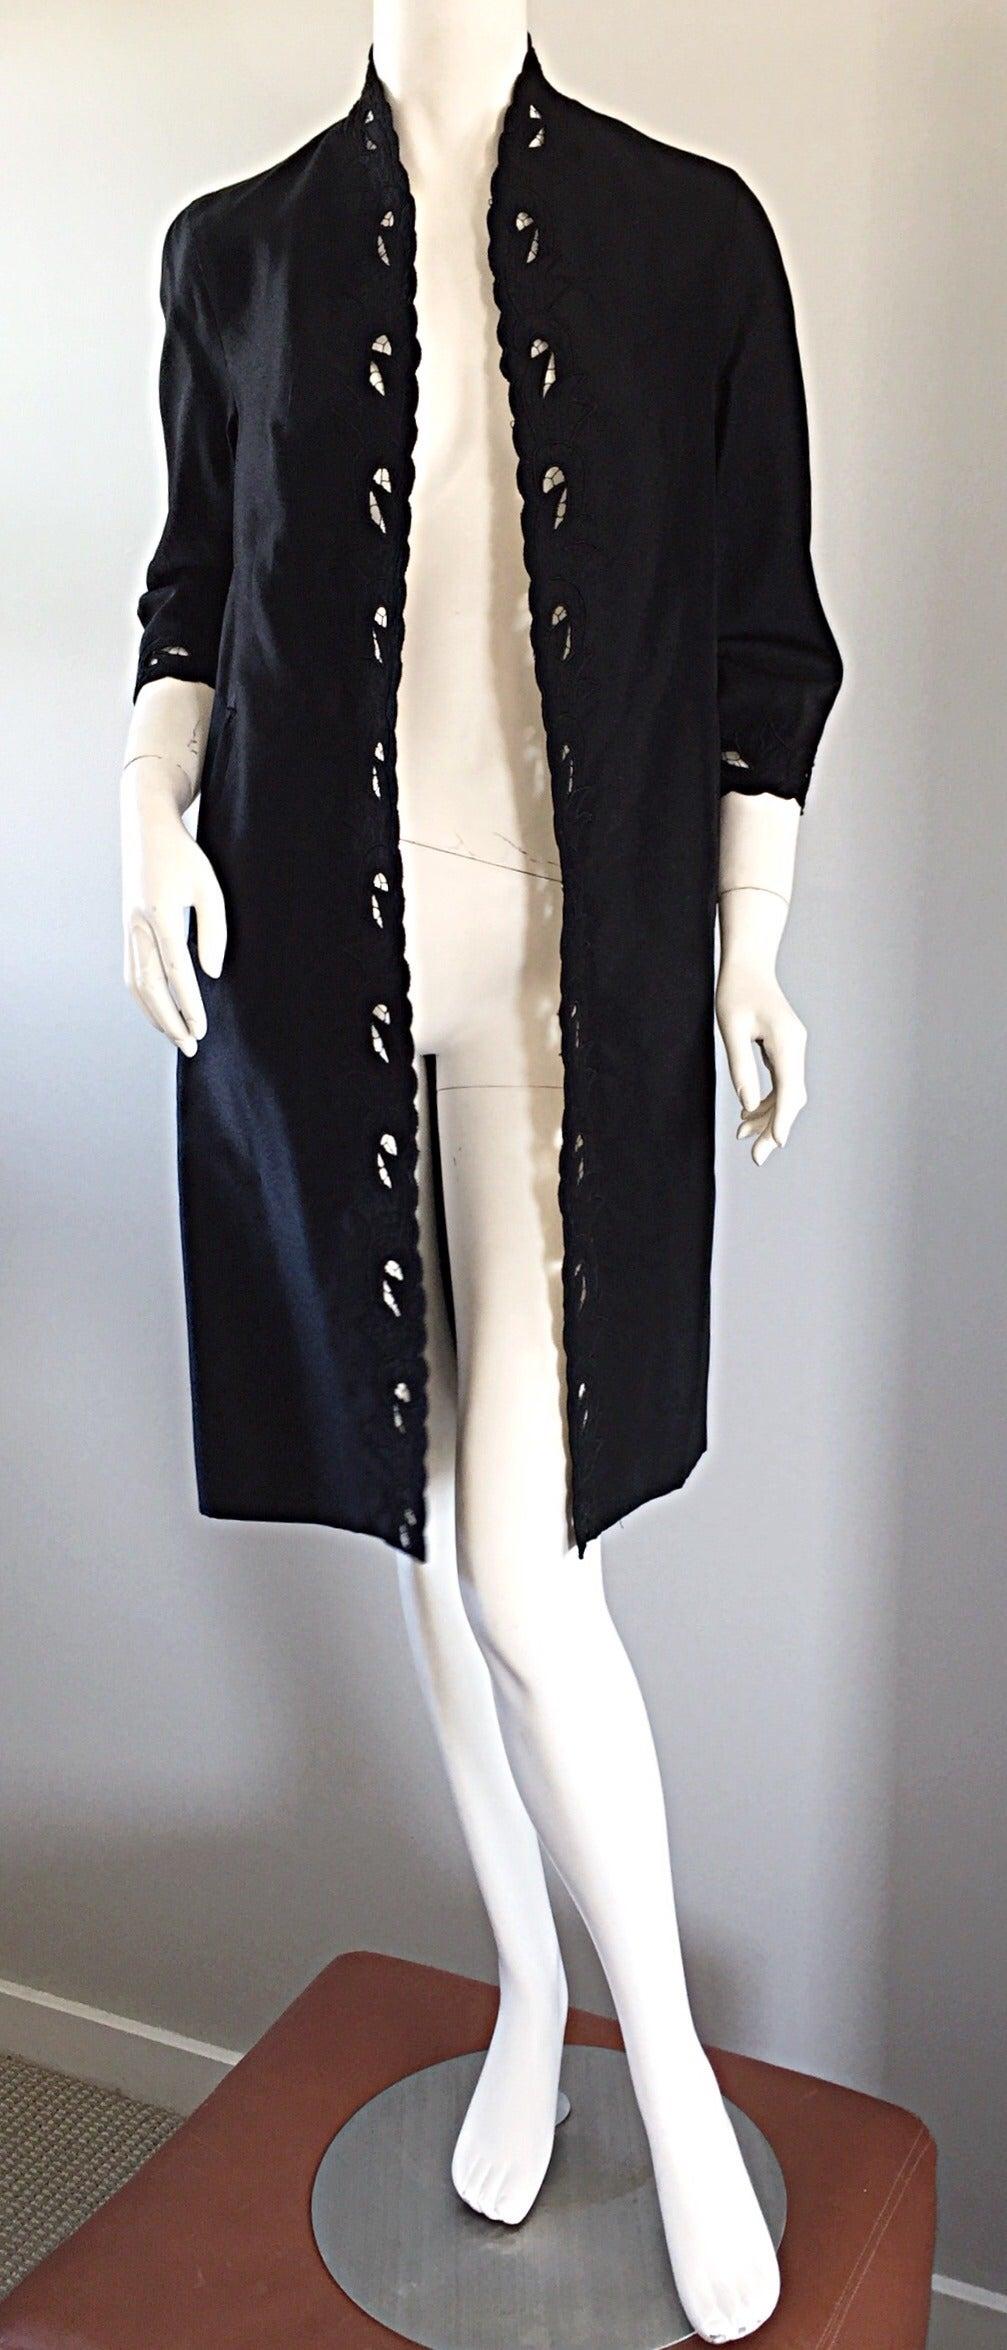 Chic 1940s Black Duster / Opera Jacket w/ Crochet Details + Scalloped Edges 4